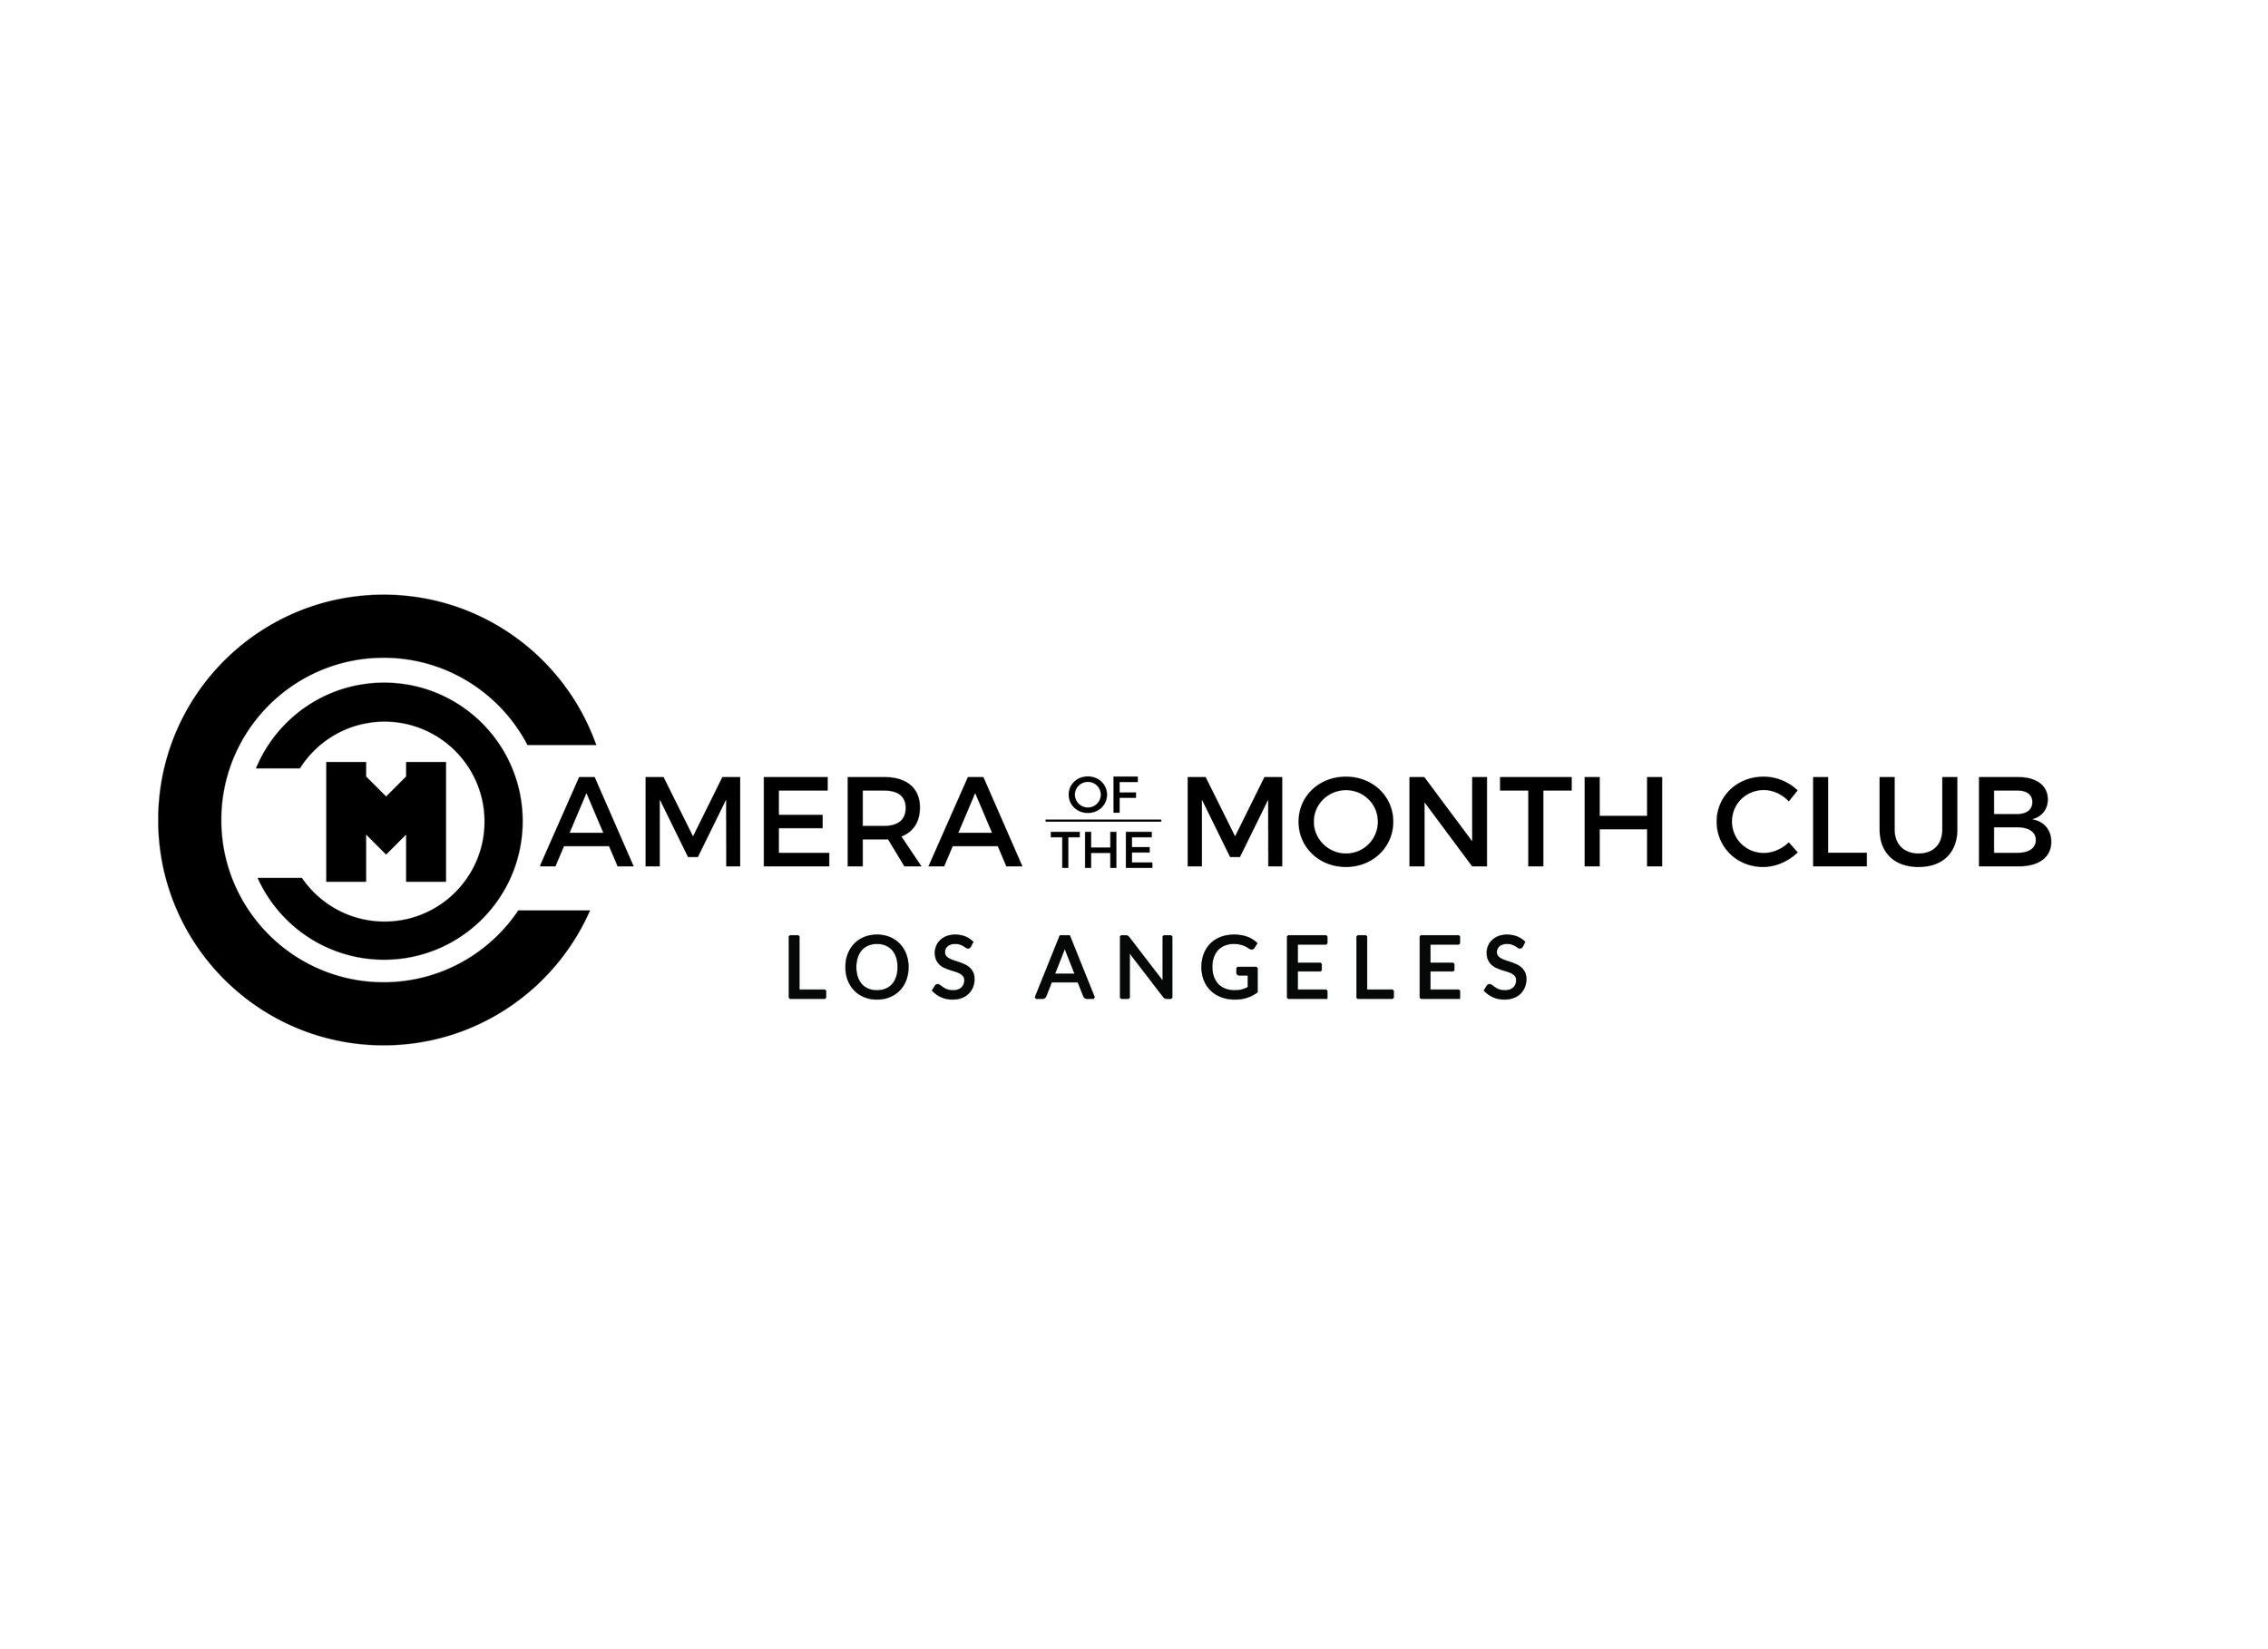 CMC C logo LA.jpg